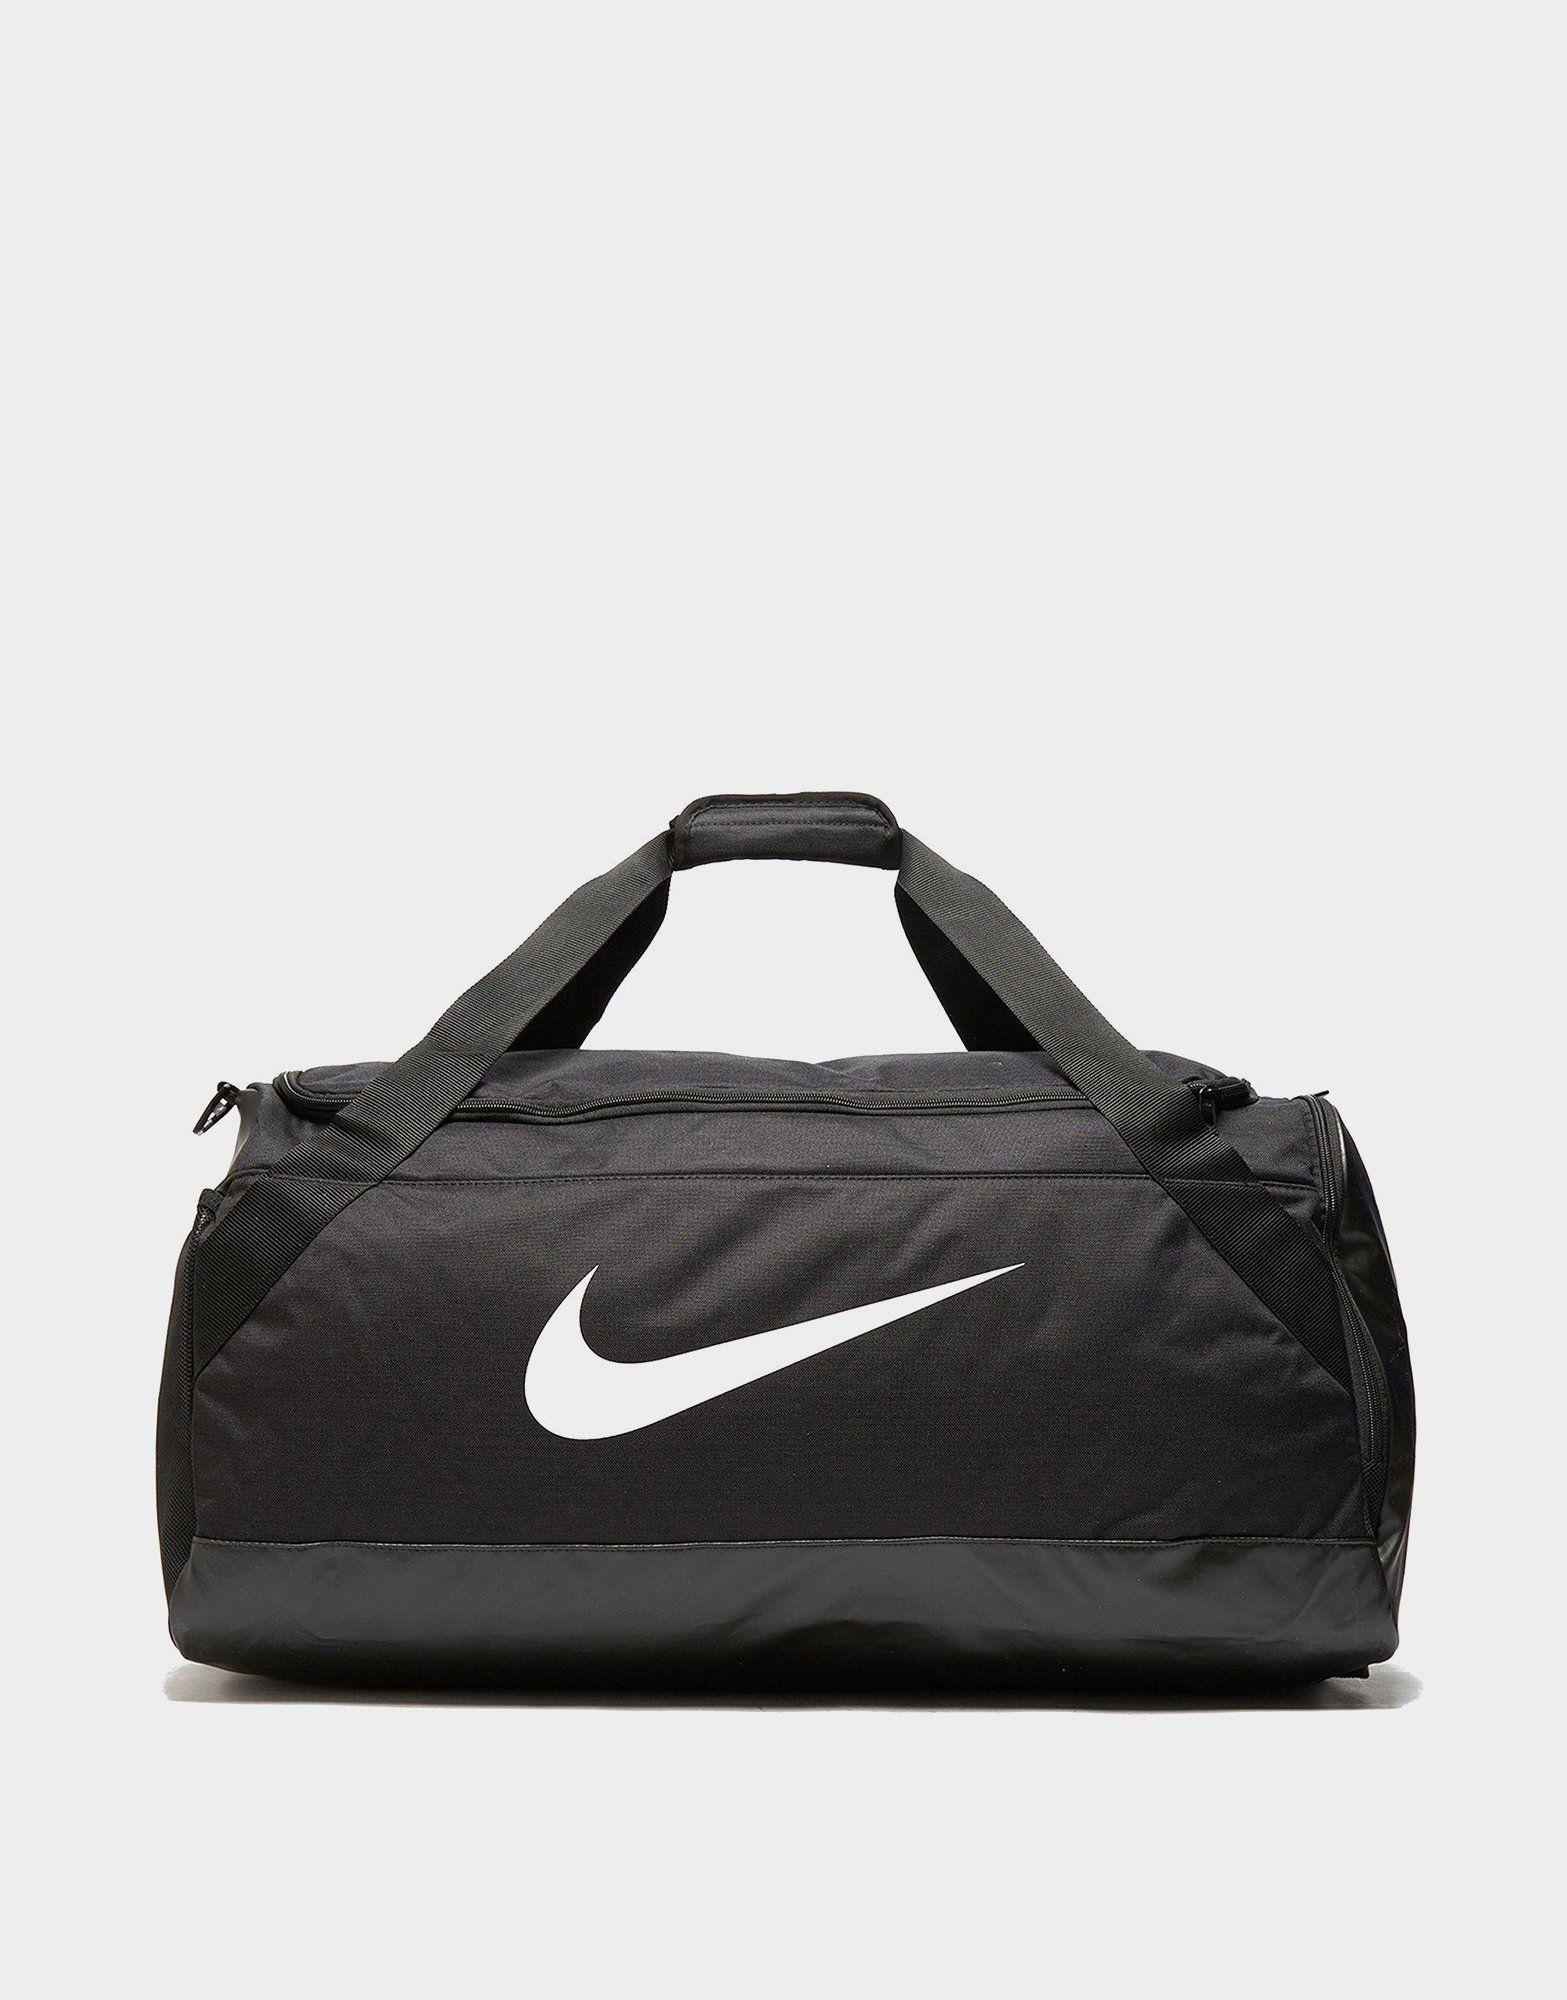 1e235bbea1dc56 NIKE Nike Brasilia Training Duffel Bag (Large) | JD Sports